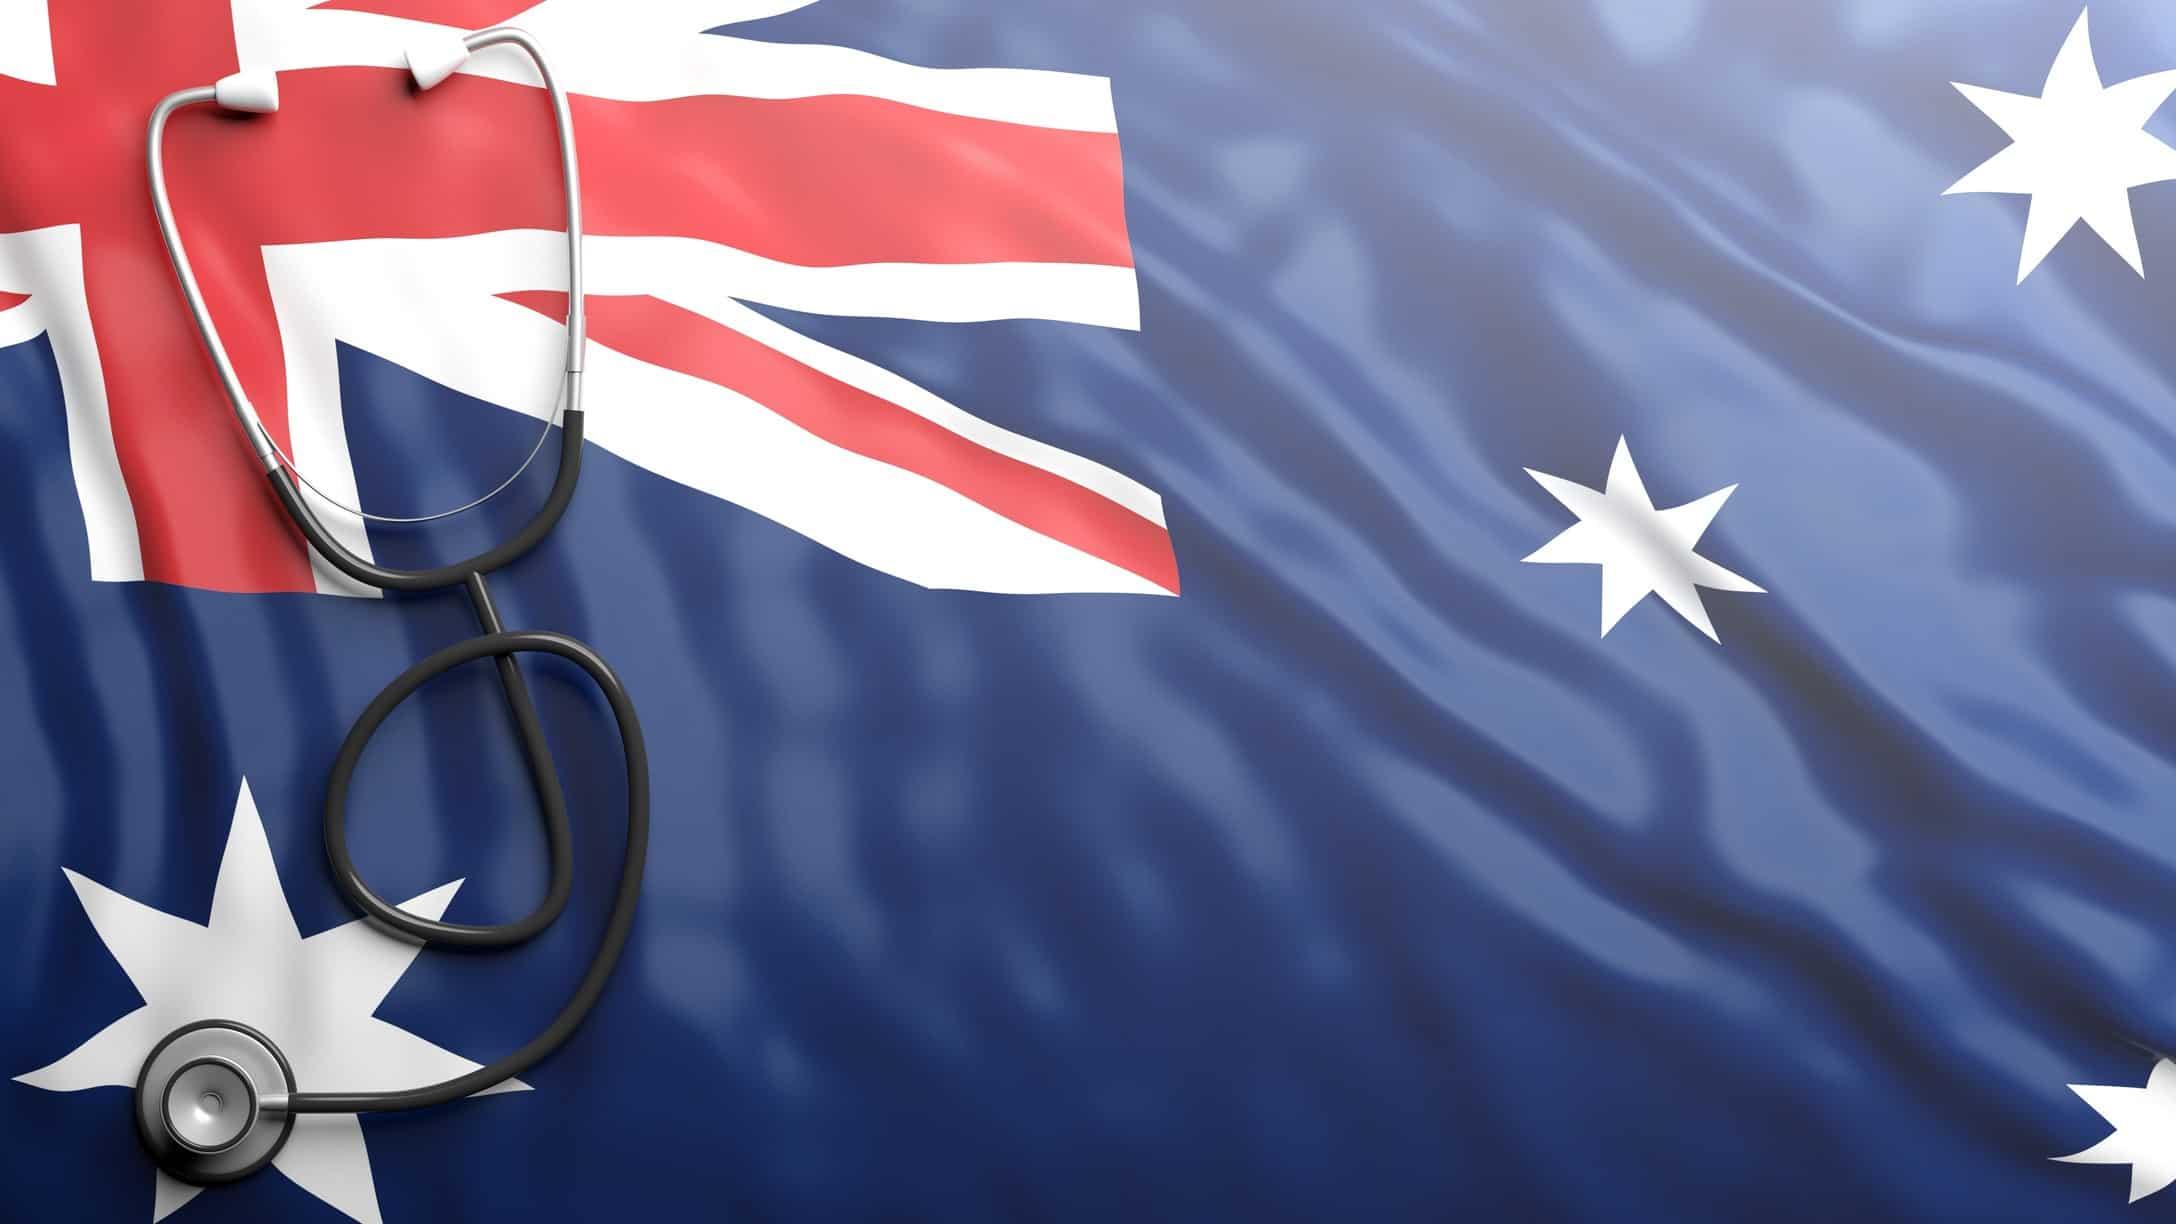 Australian flag with stethoscope on it